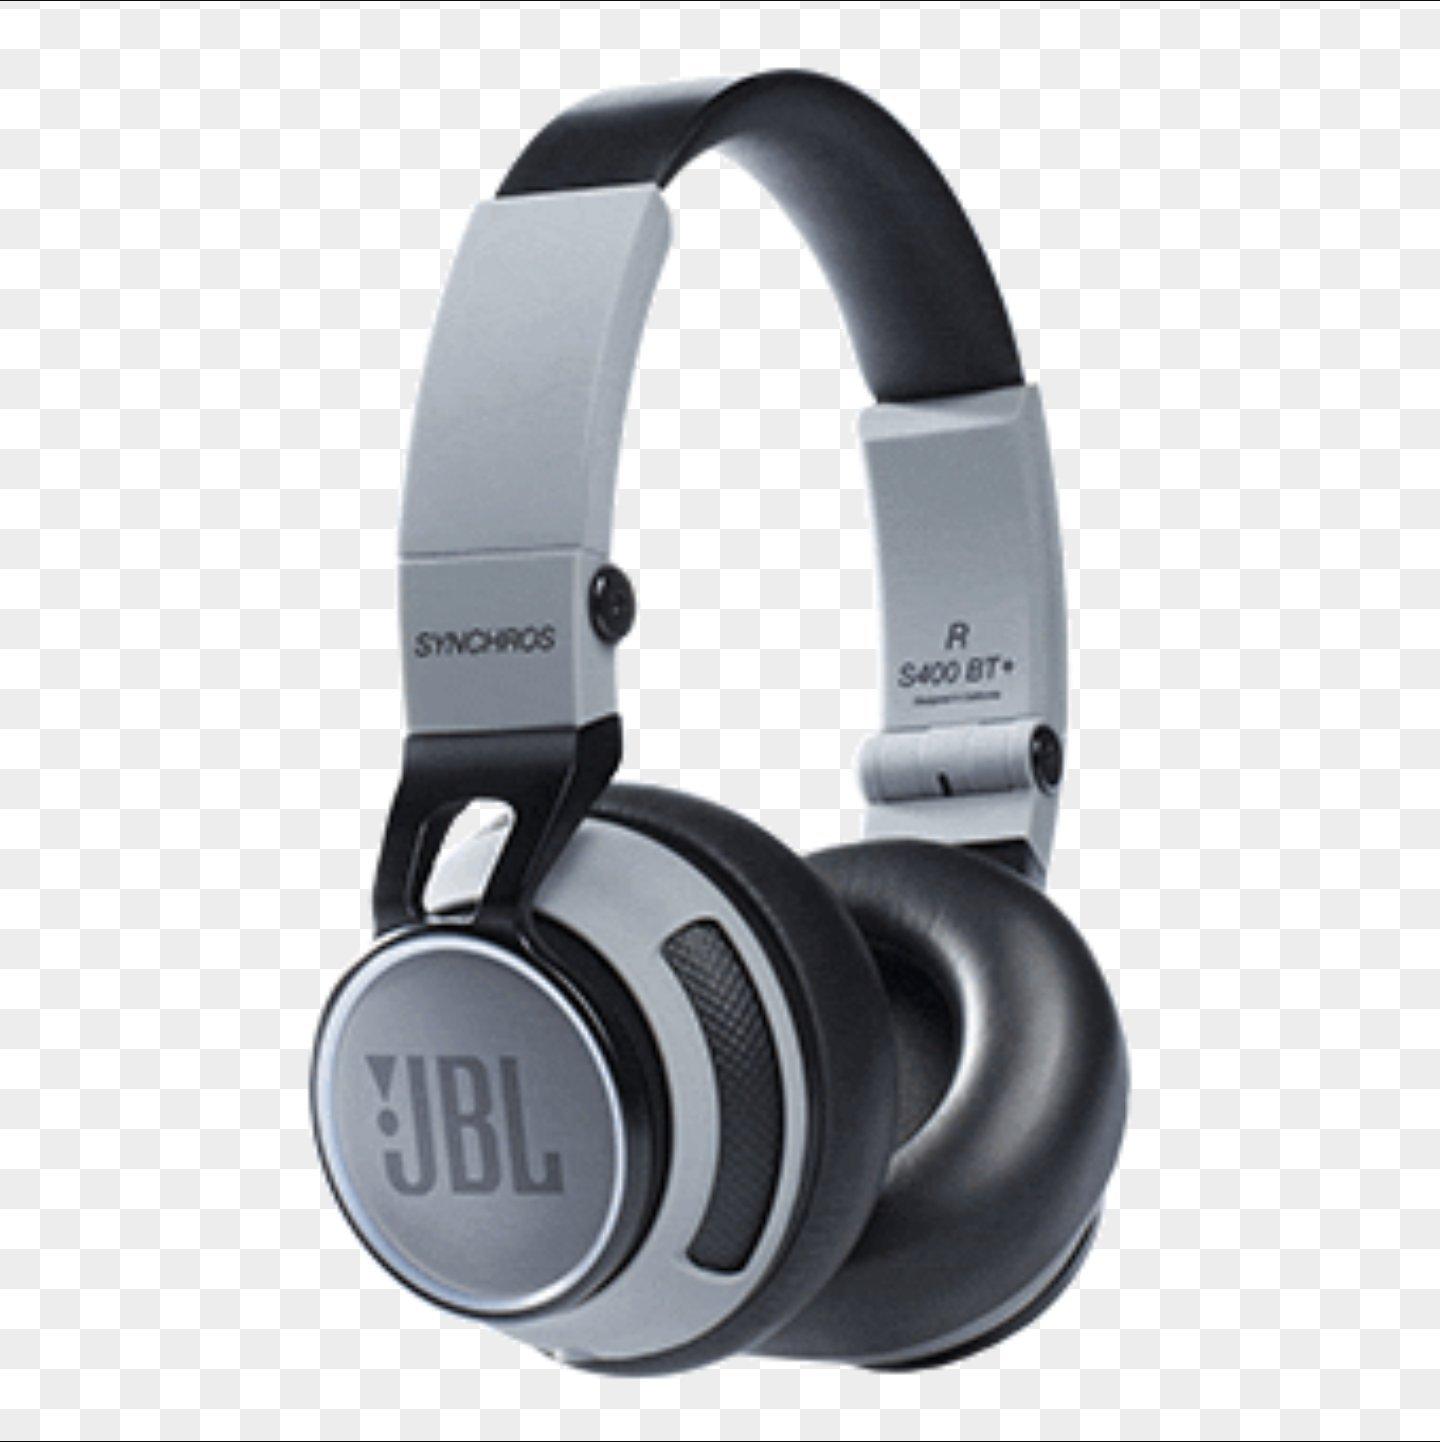 d942c4d3534 JBL Synchros S400BT+ Wireless On-Ear Bluetooth Stereo Headphones (Stealth  Gray): Amazon.ca: Electronics